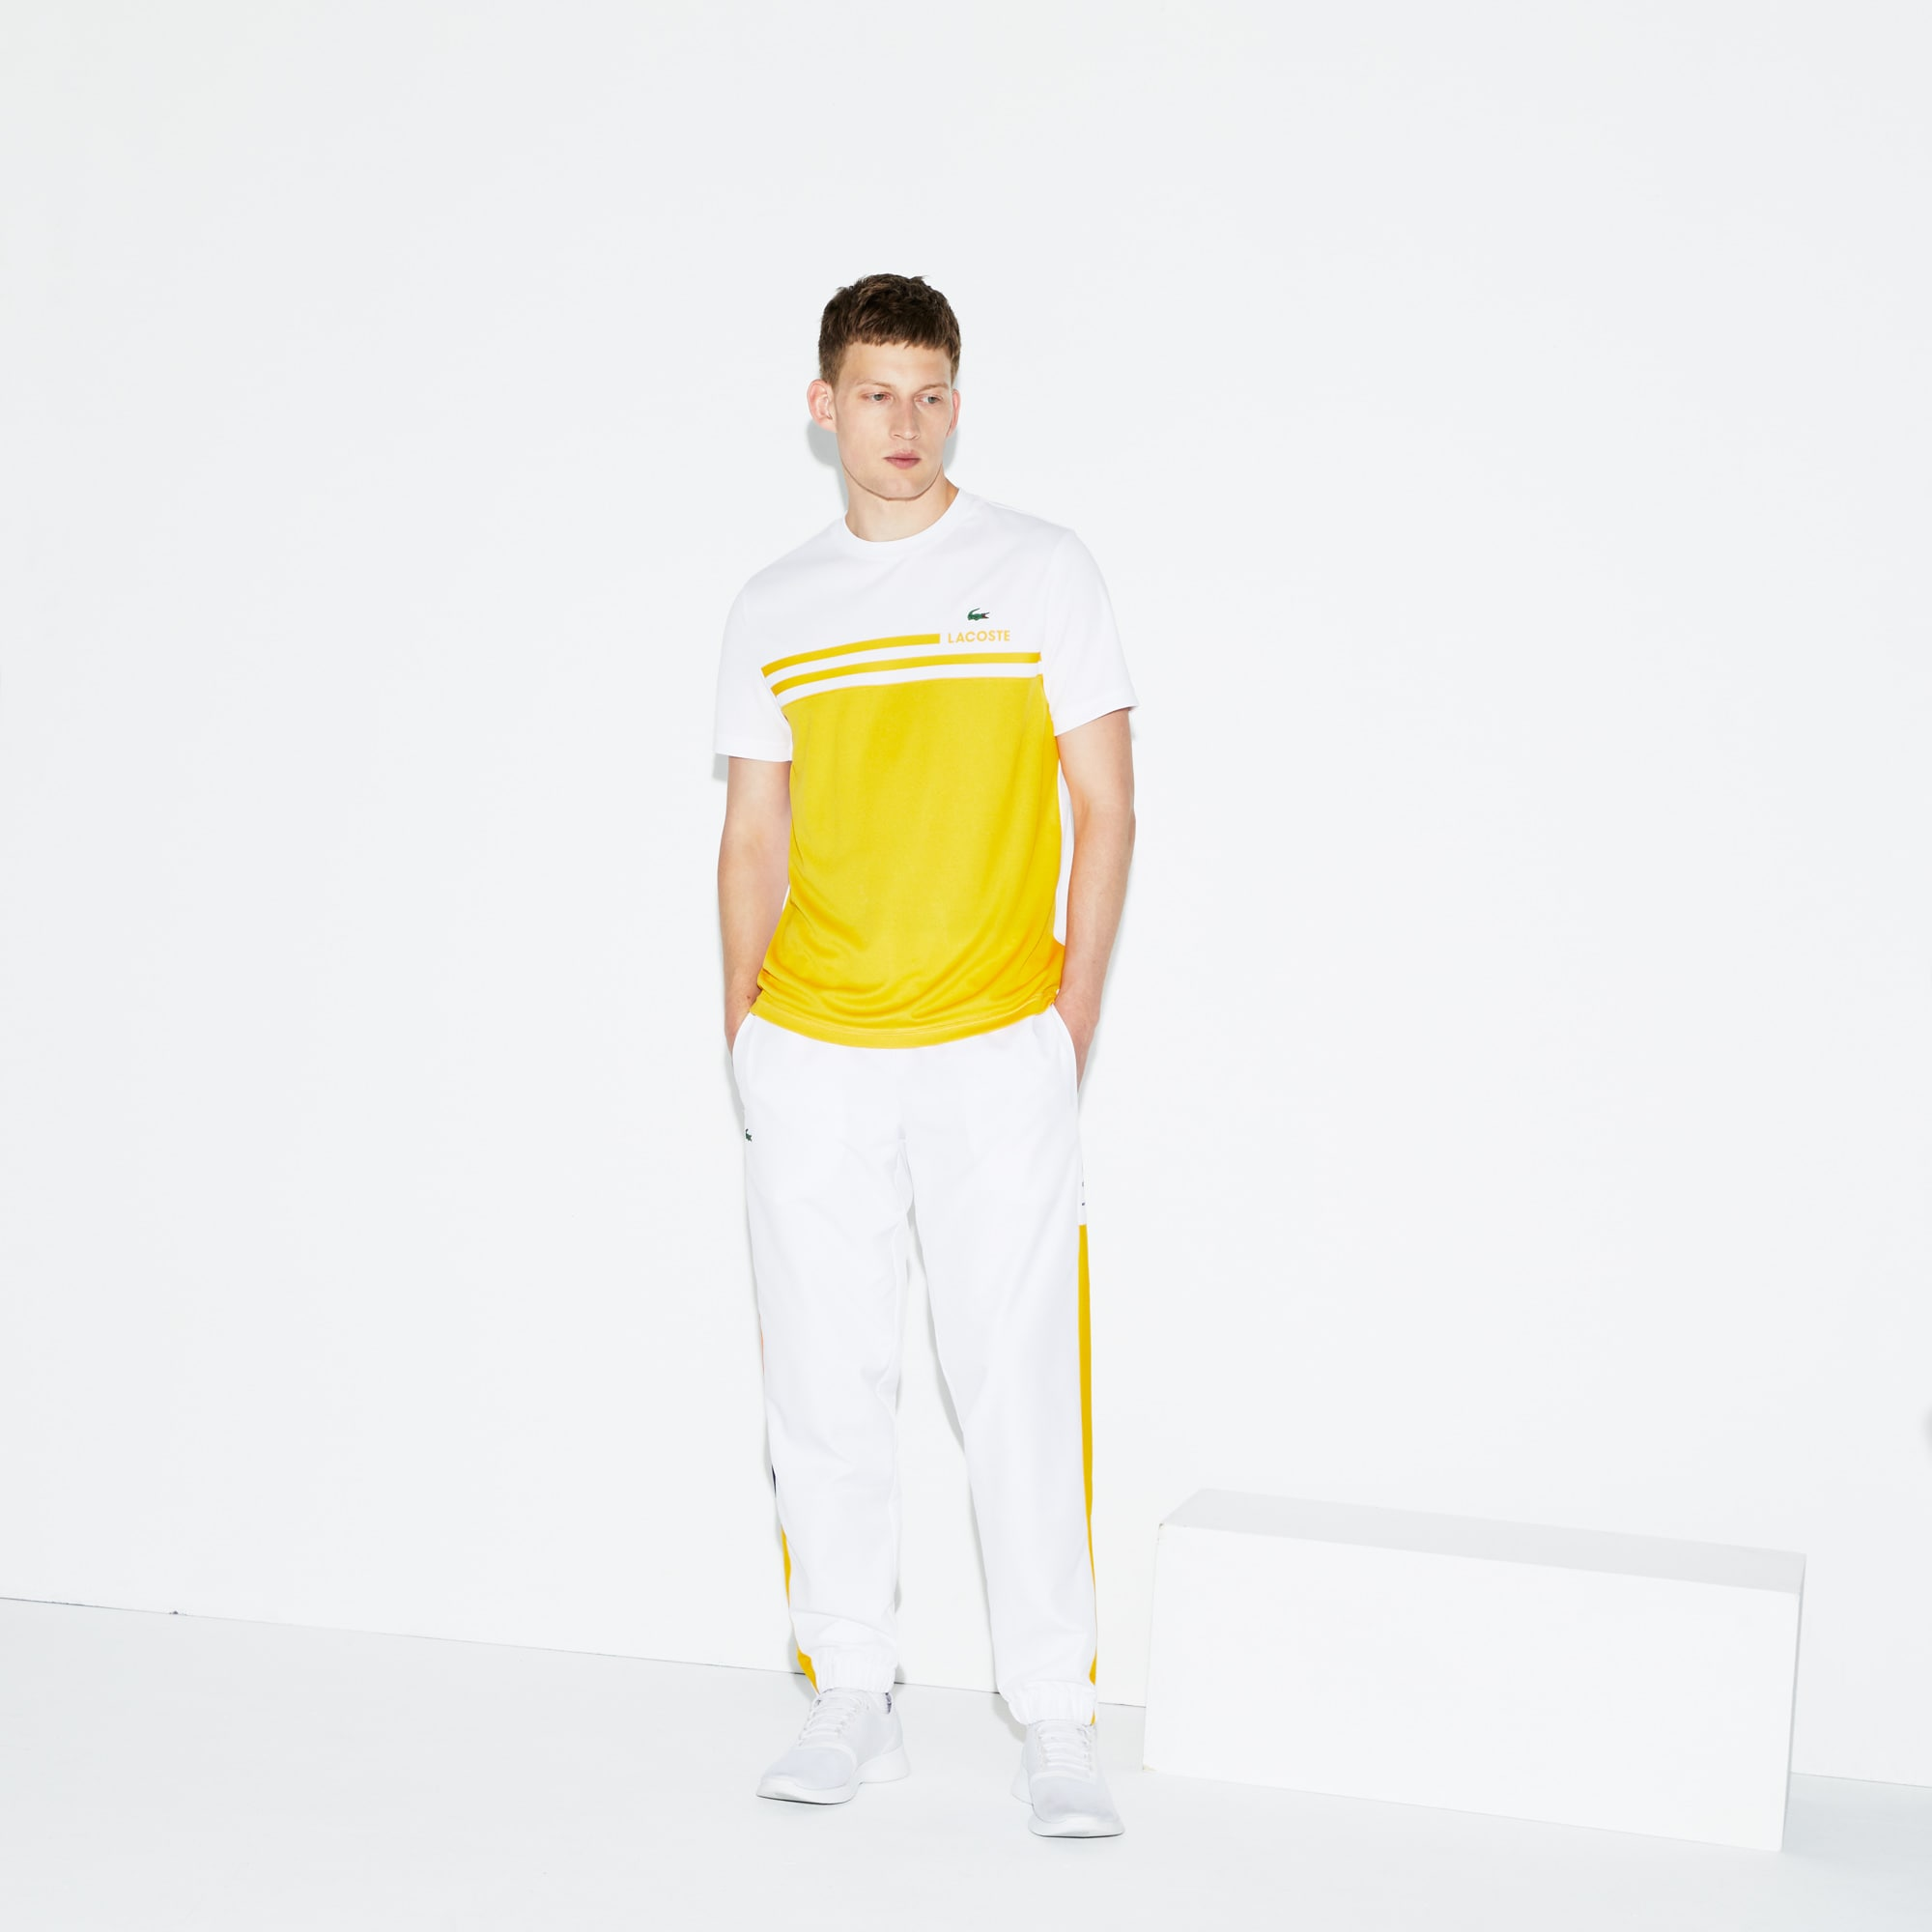 Herren-Trainingshose im Colorblock-Design LACOSTE SPORT TENNIS